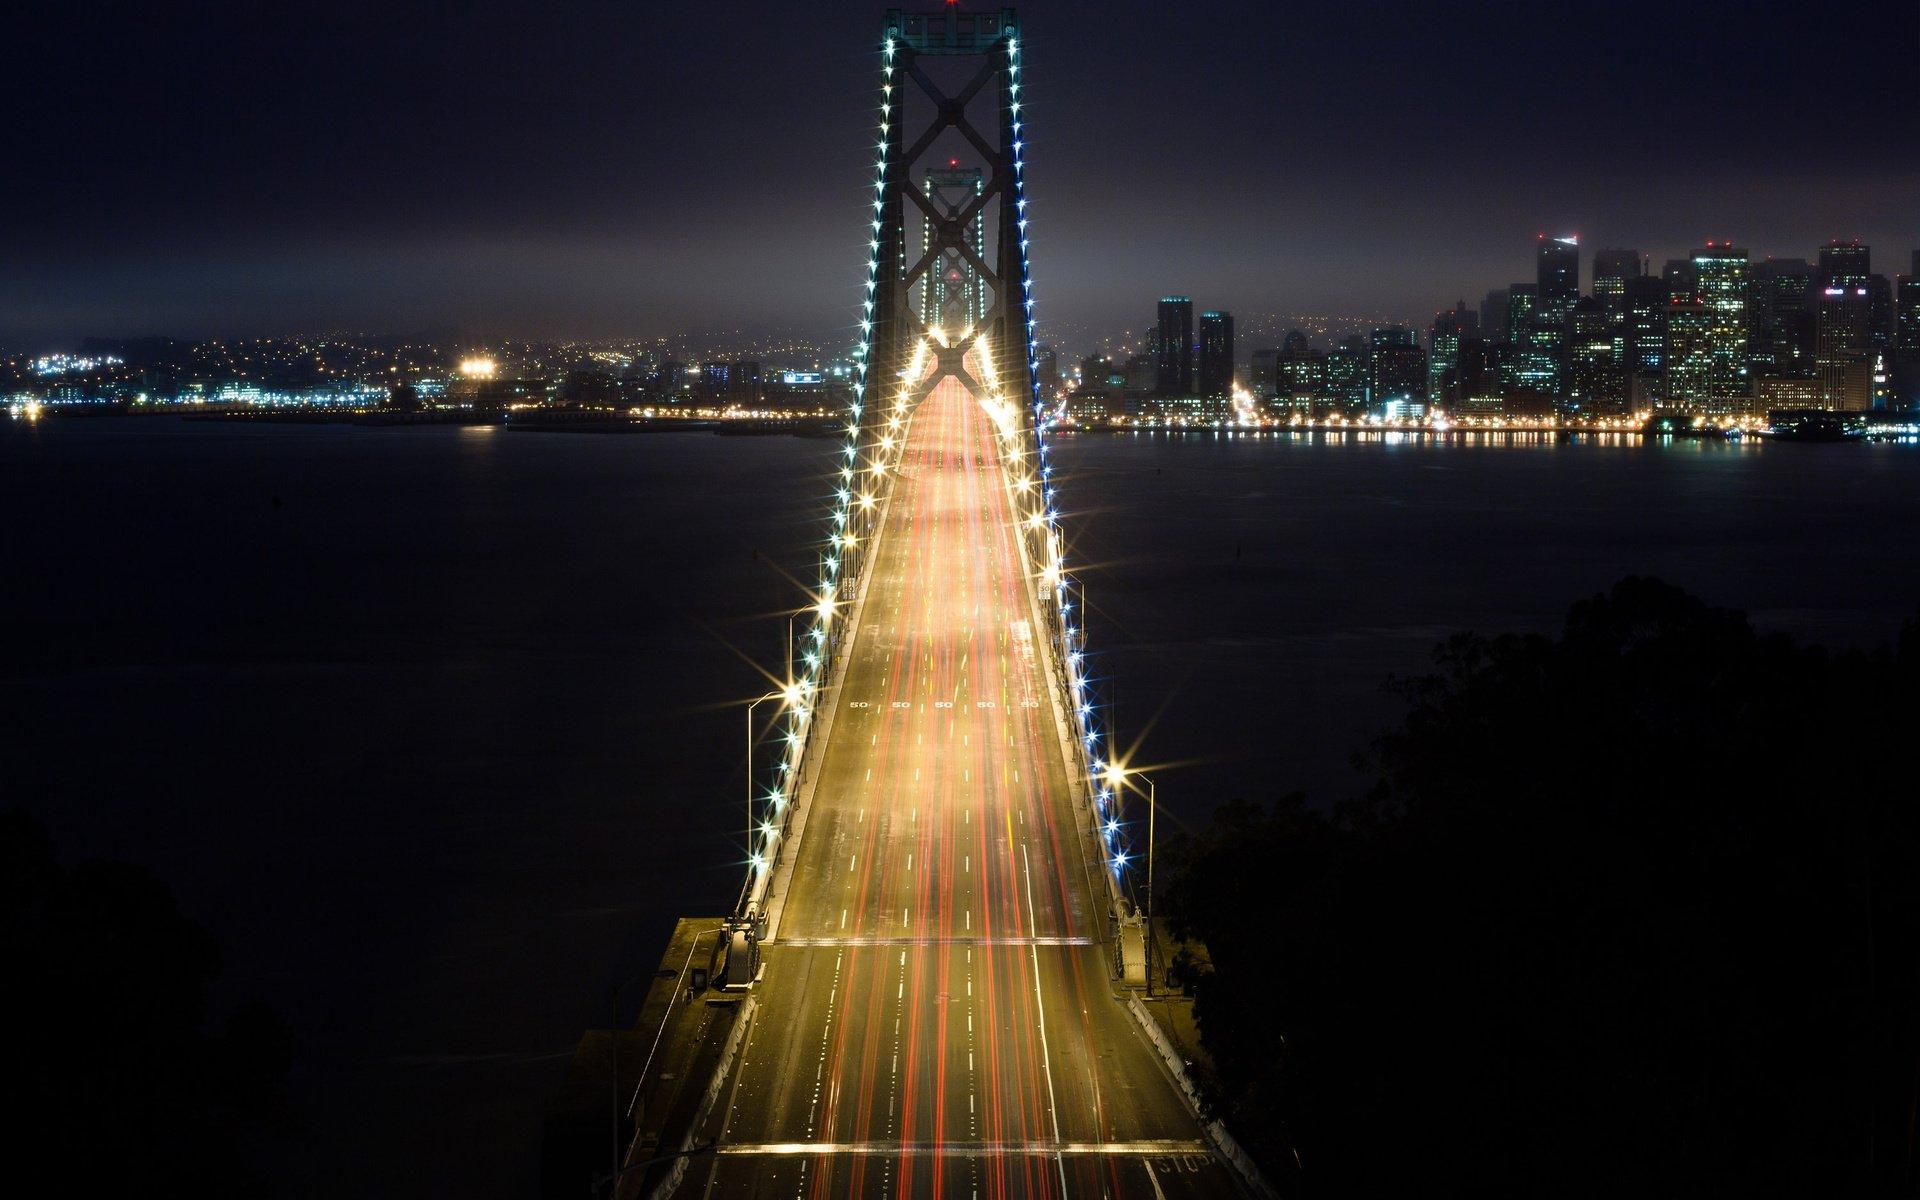 развязка огни ночь мост interchange lights night the bridge загрузить